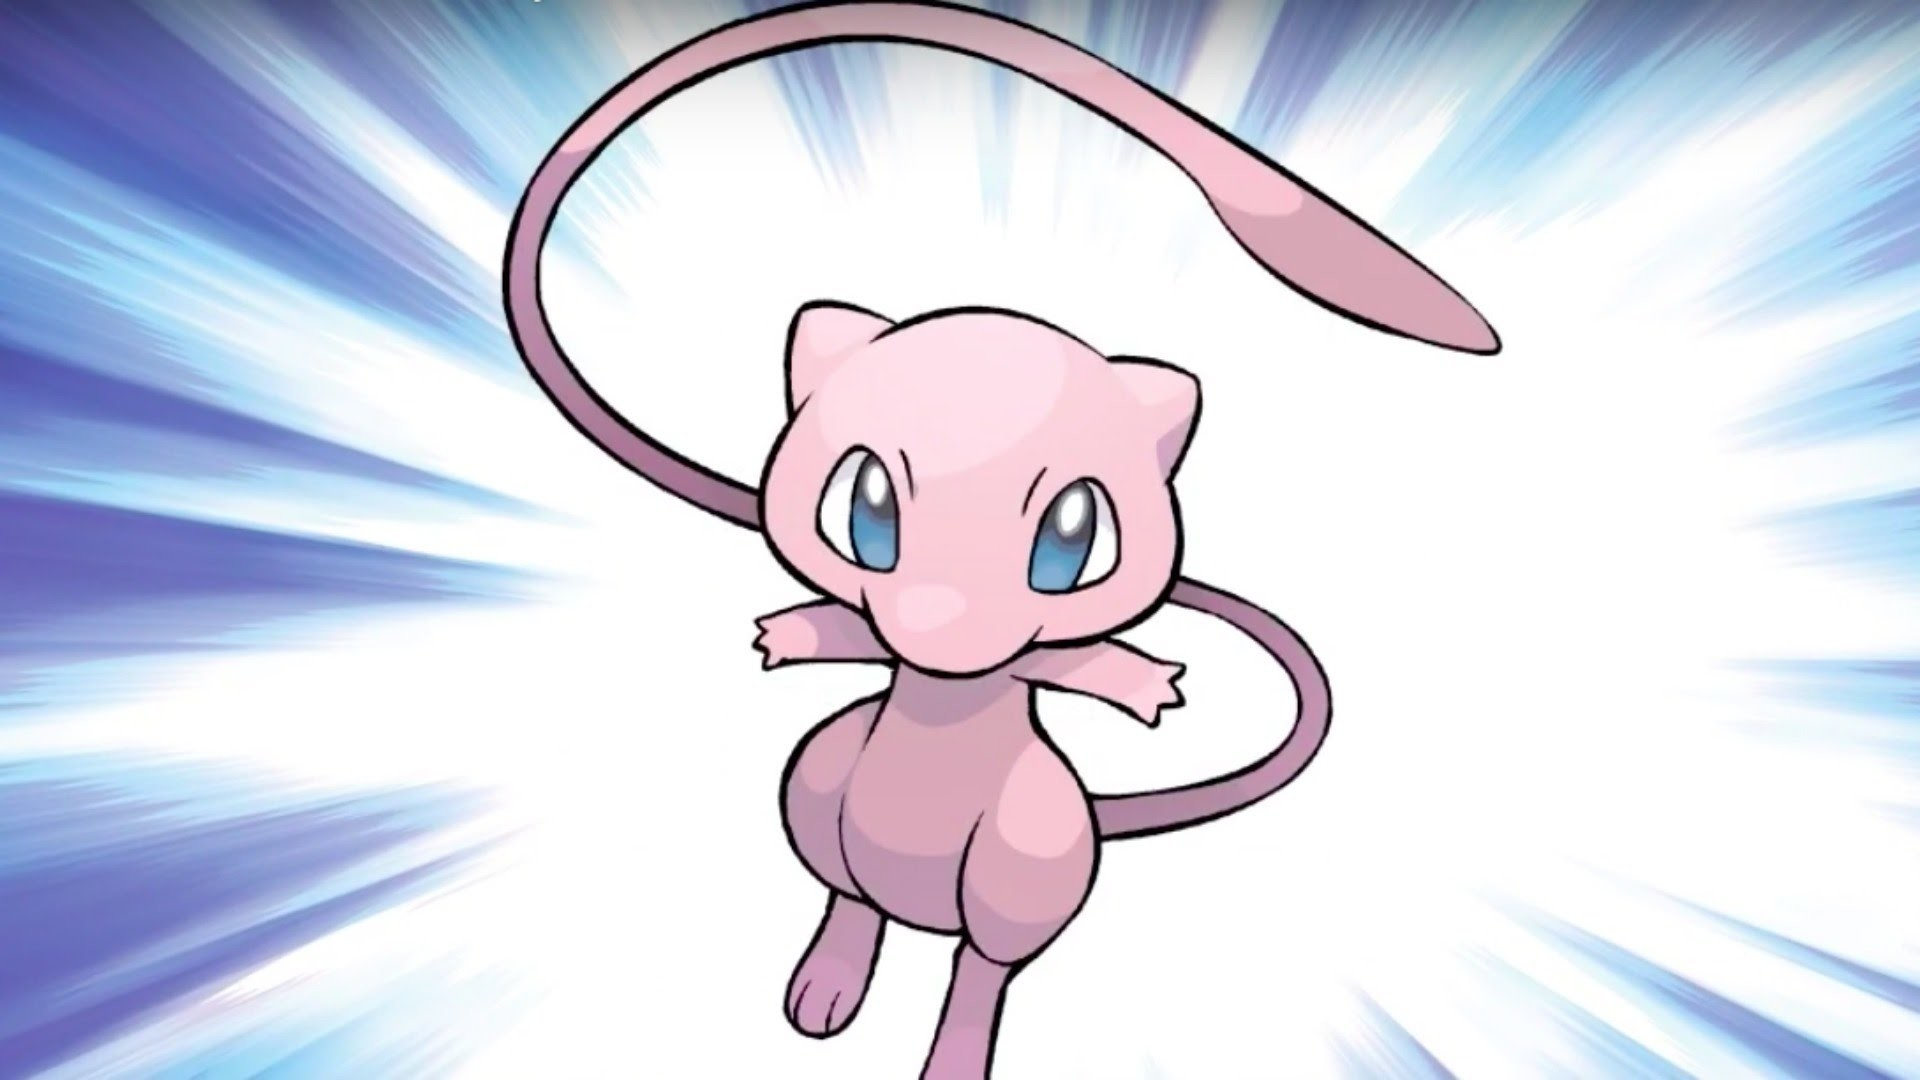 Pokemon Mew Wallpaper (80+ images)